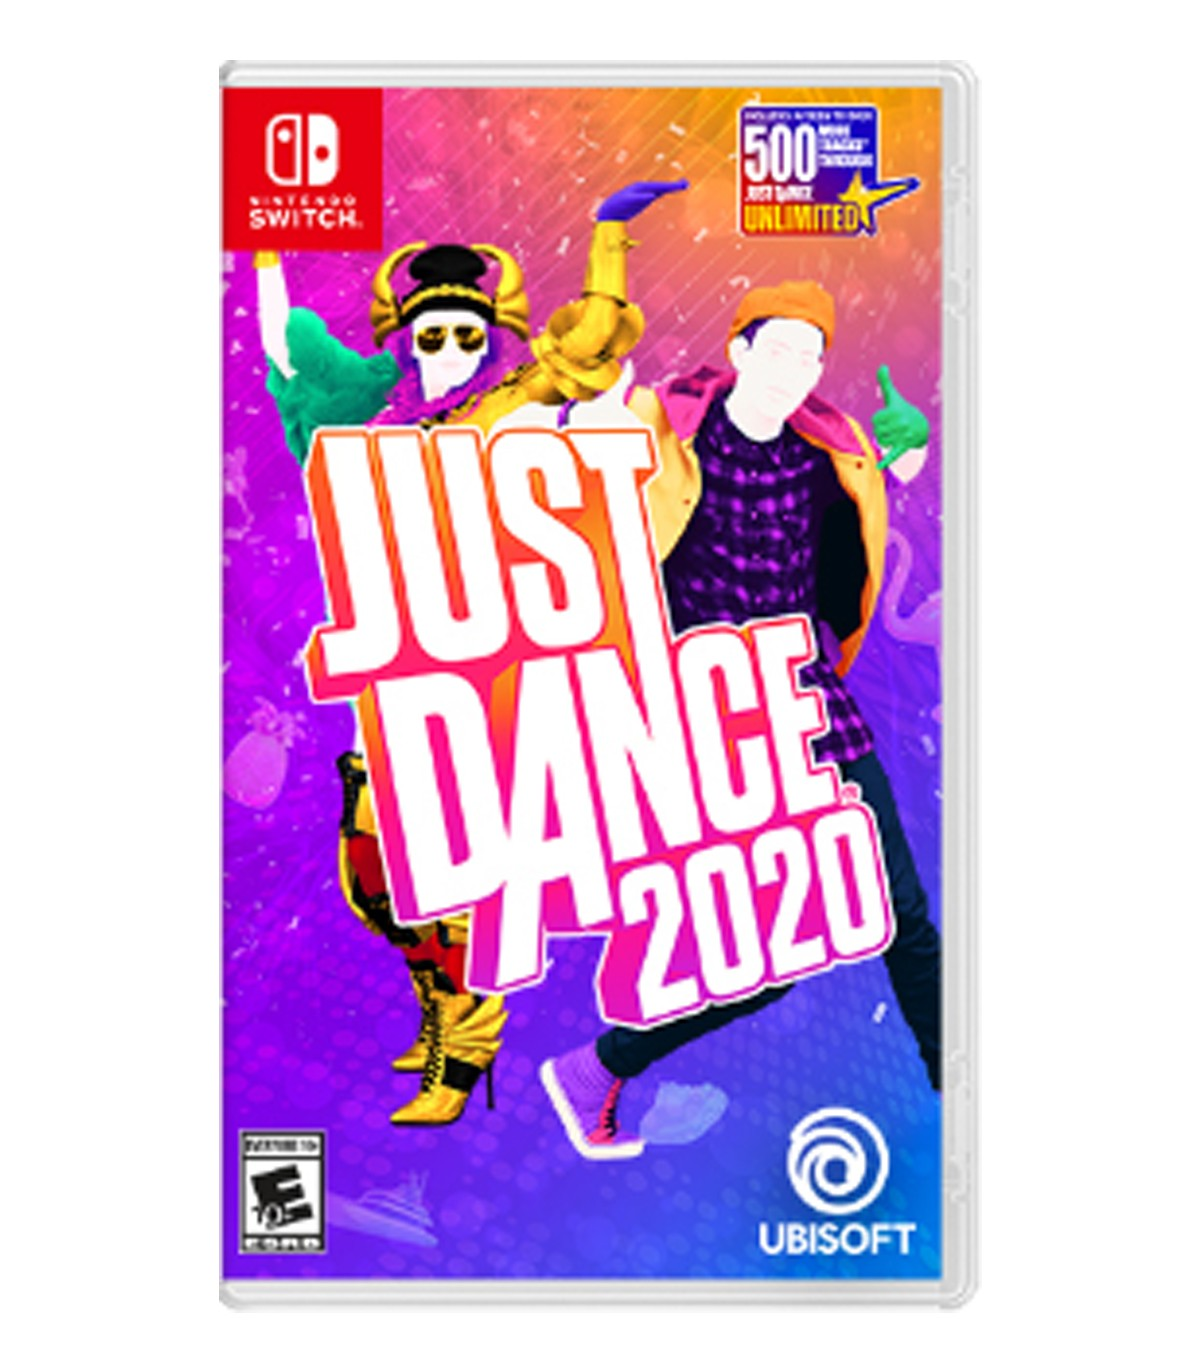 بازی Just Dance 2020 - نینتندو سوئیچ